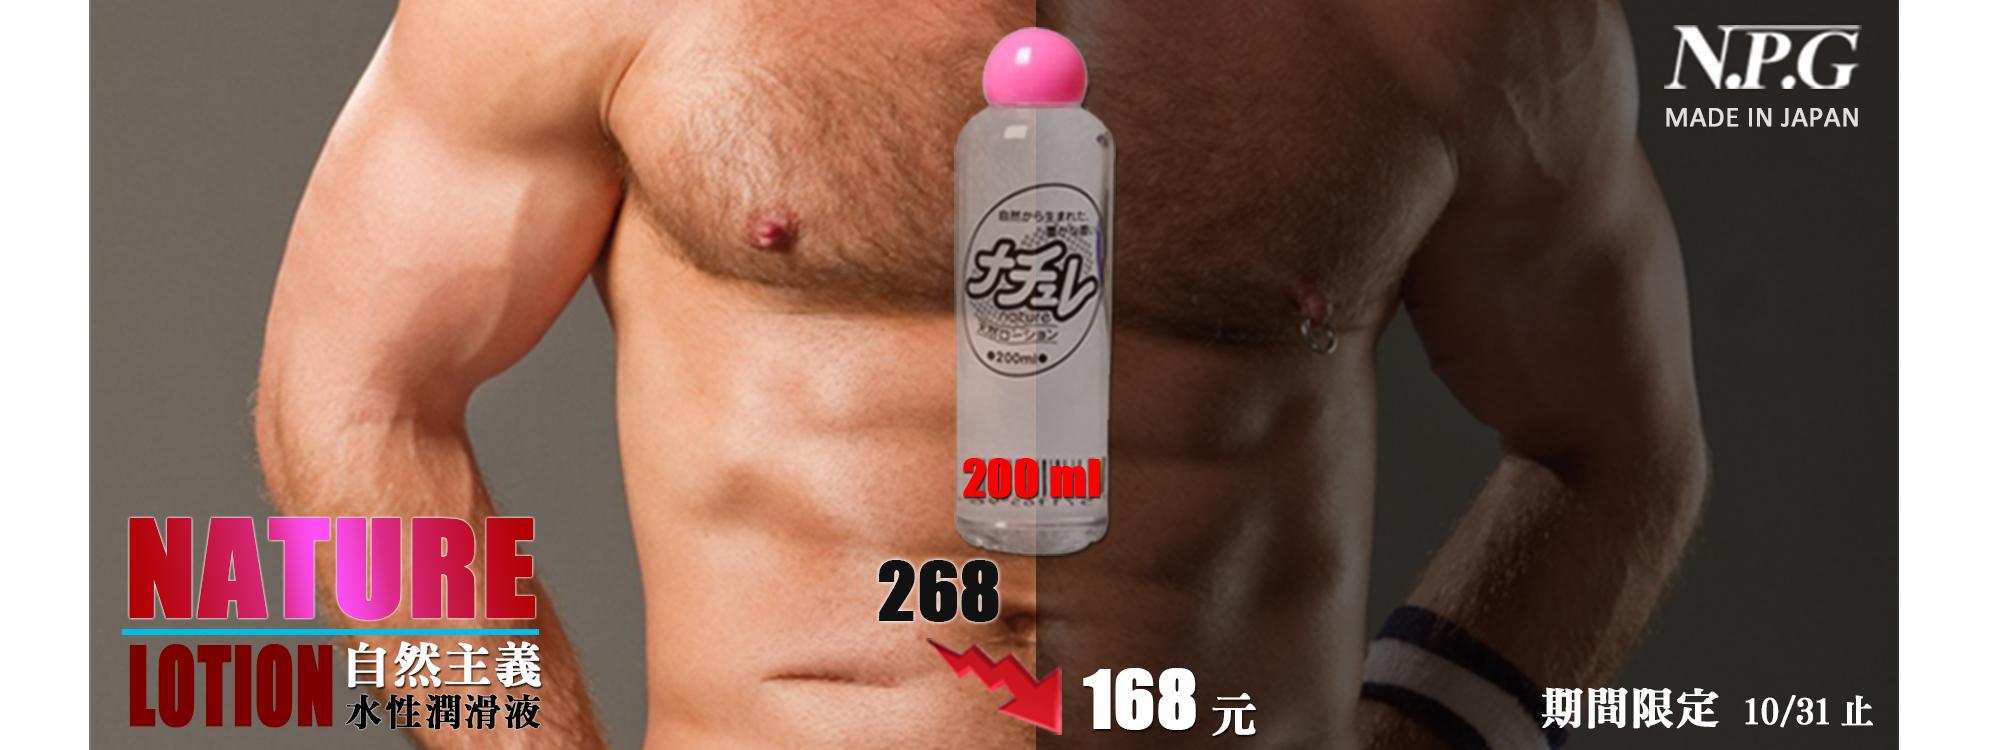 水性潤滑液, nature lotion, KY, 潤滑液推薦, 好用KY,